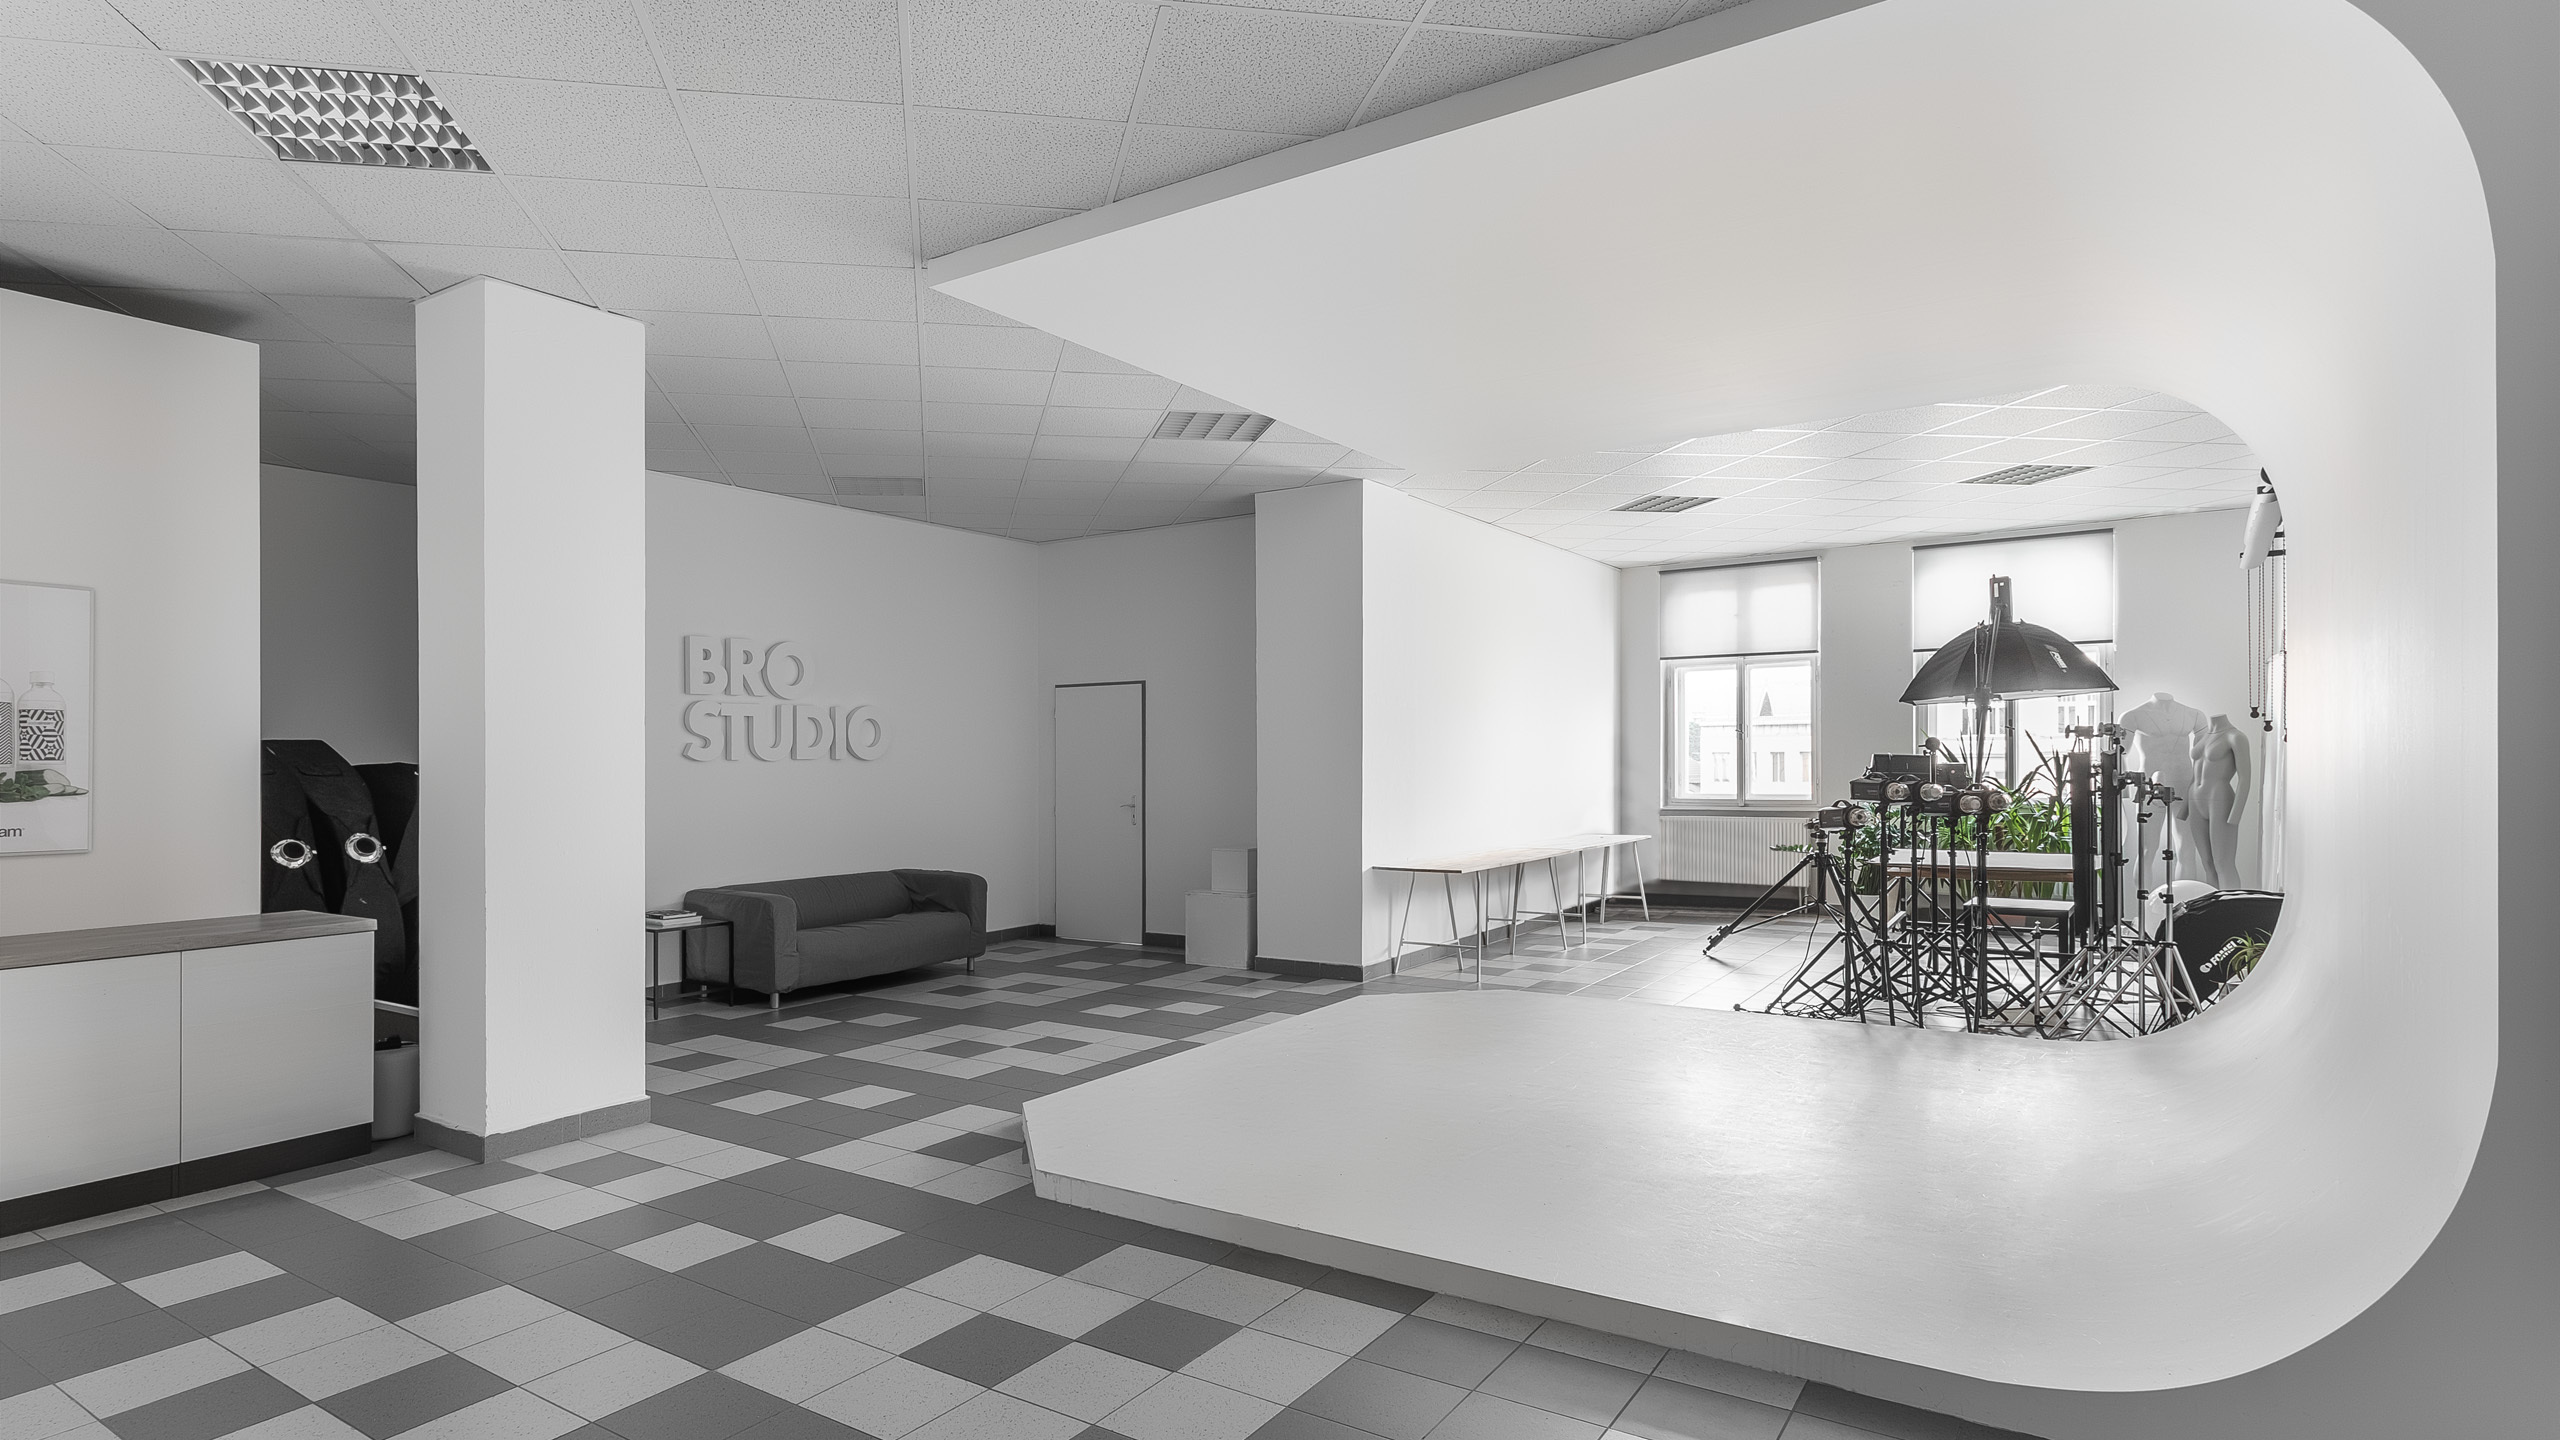 Brostudio - product photography studio